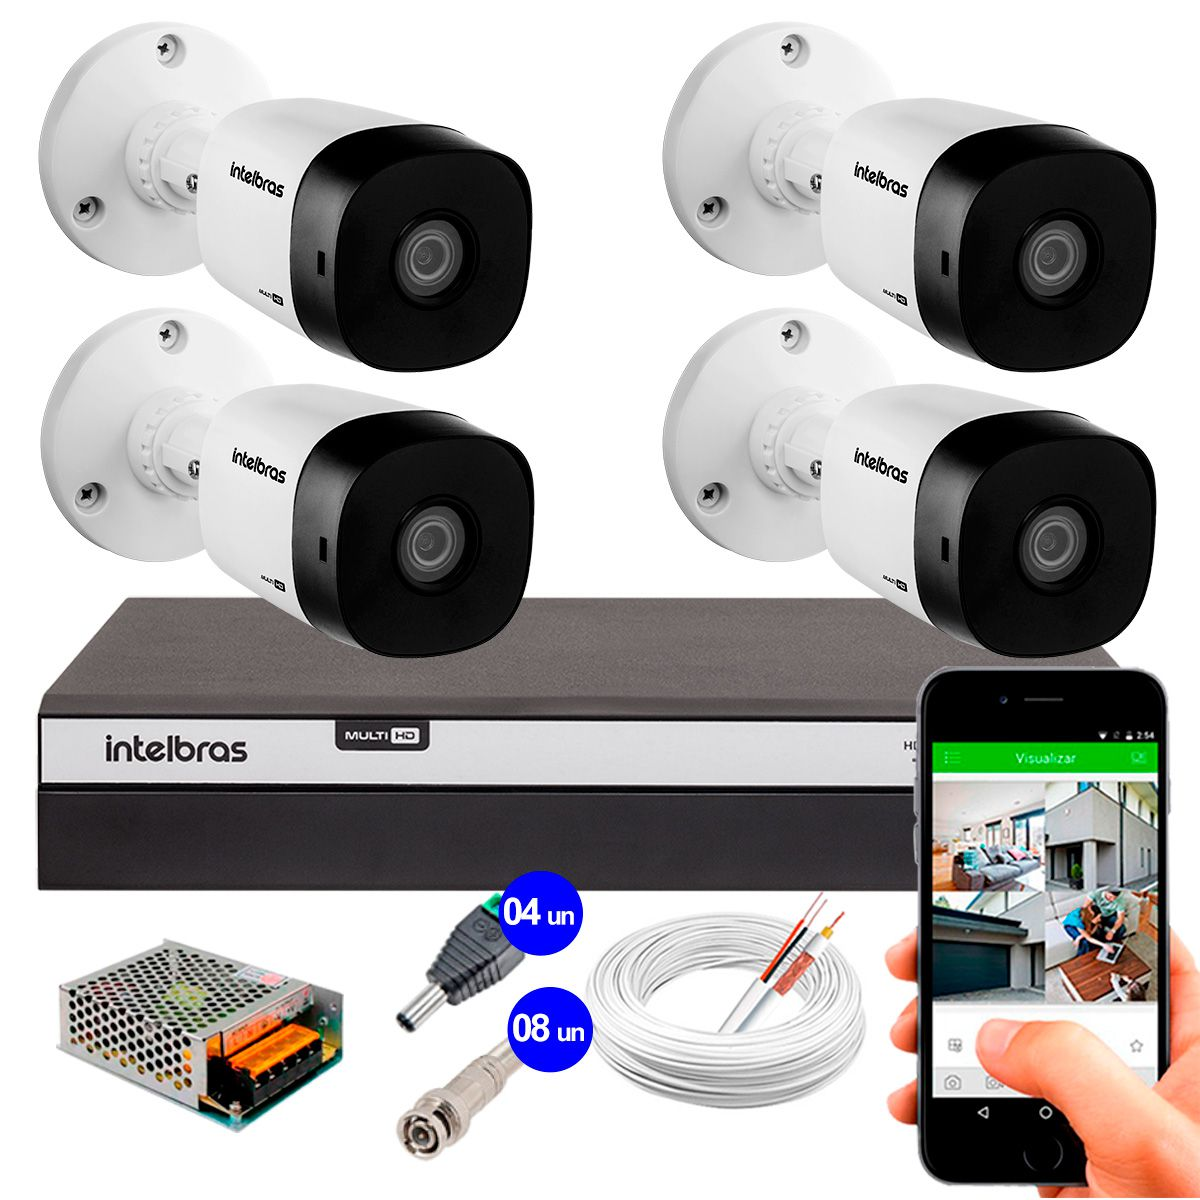 Kit 4 Câmeras de Segurança Full HD 1080p Intelbras VHD 1220B IR + DVR Intelbras Full HD 4 Ch + Acessórios  - Tudo Forte